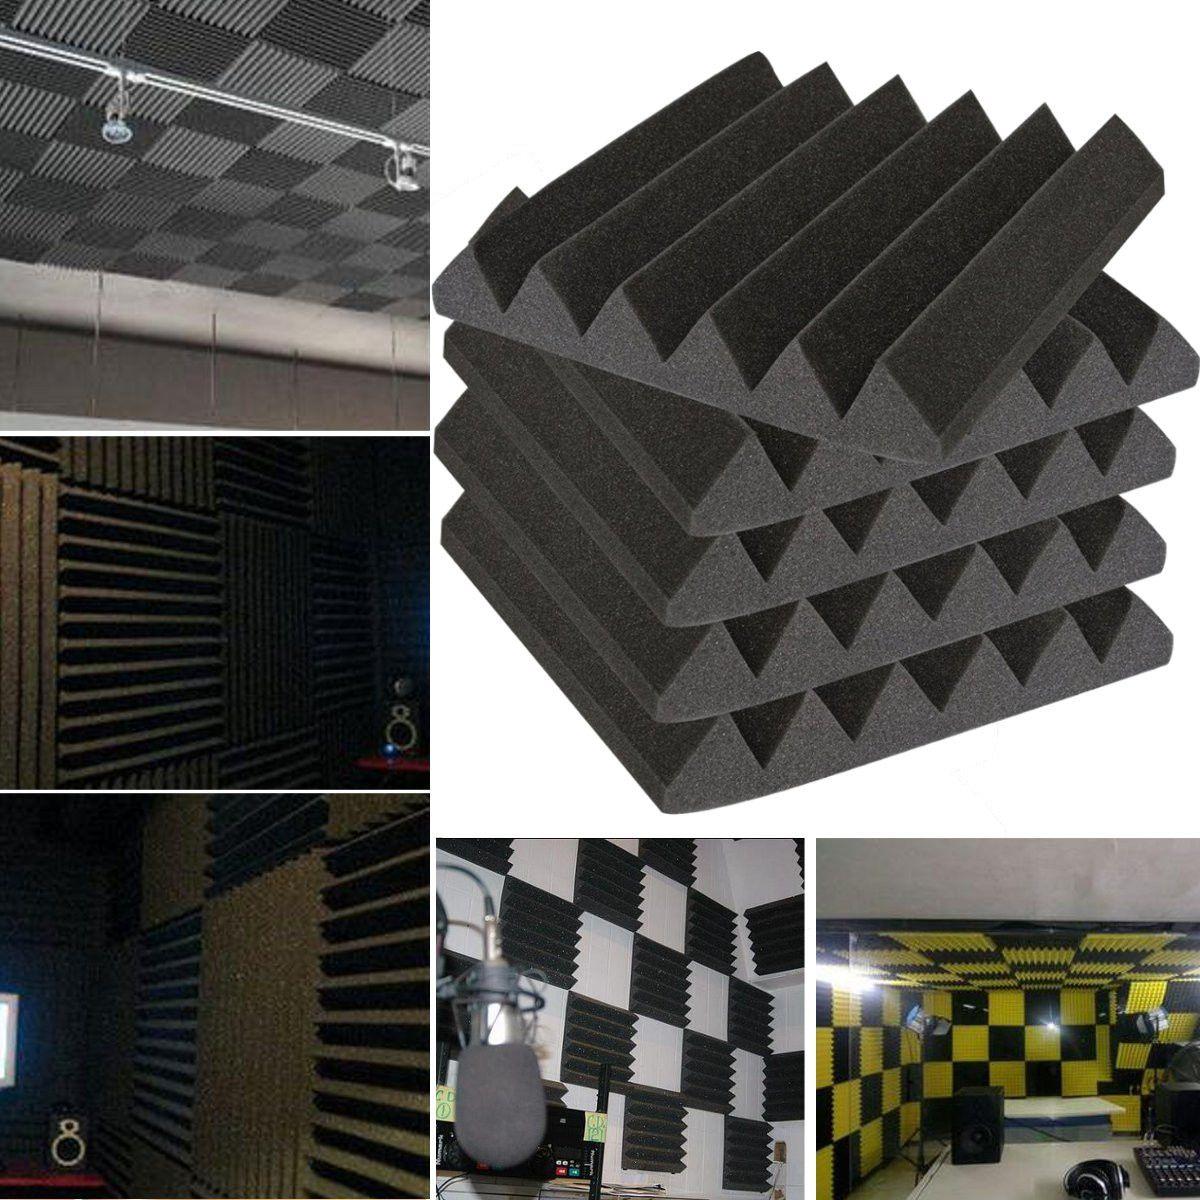 8Pcs 30x 30x 5cm Acoustic Foam Soundproofing Foam Sound Treatment Studio Room Absorption Wedge Tiles Polyurethane Foam